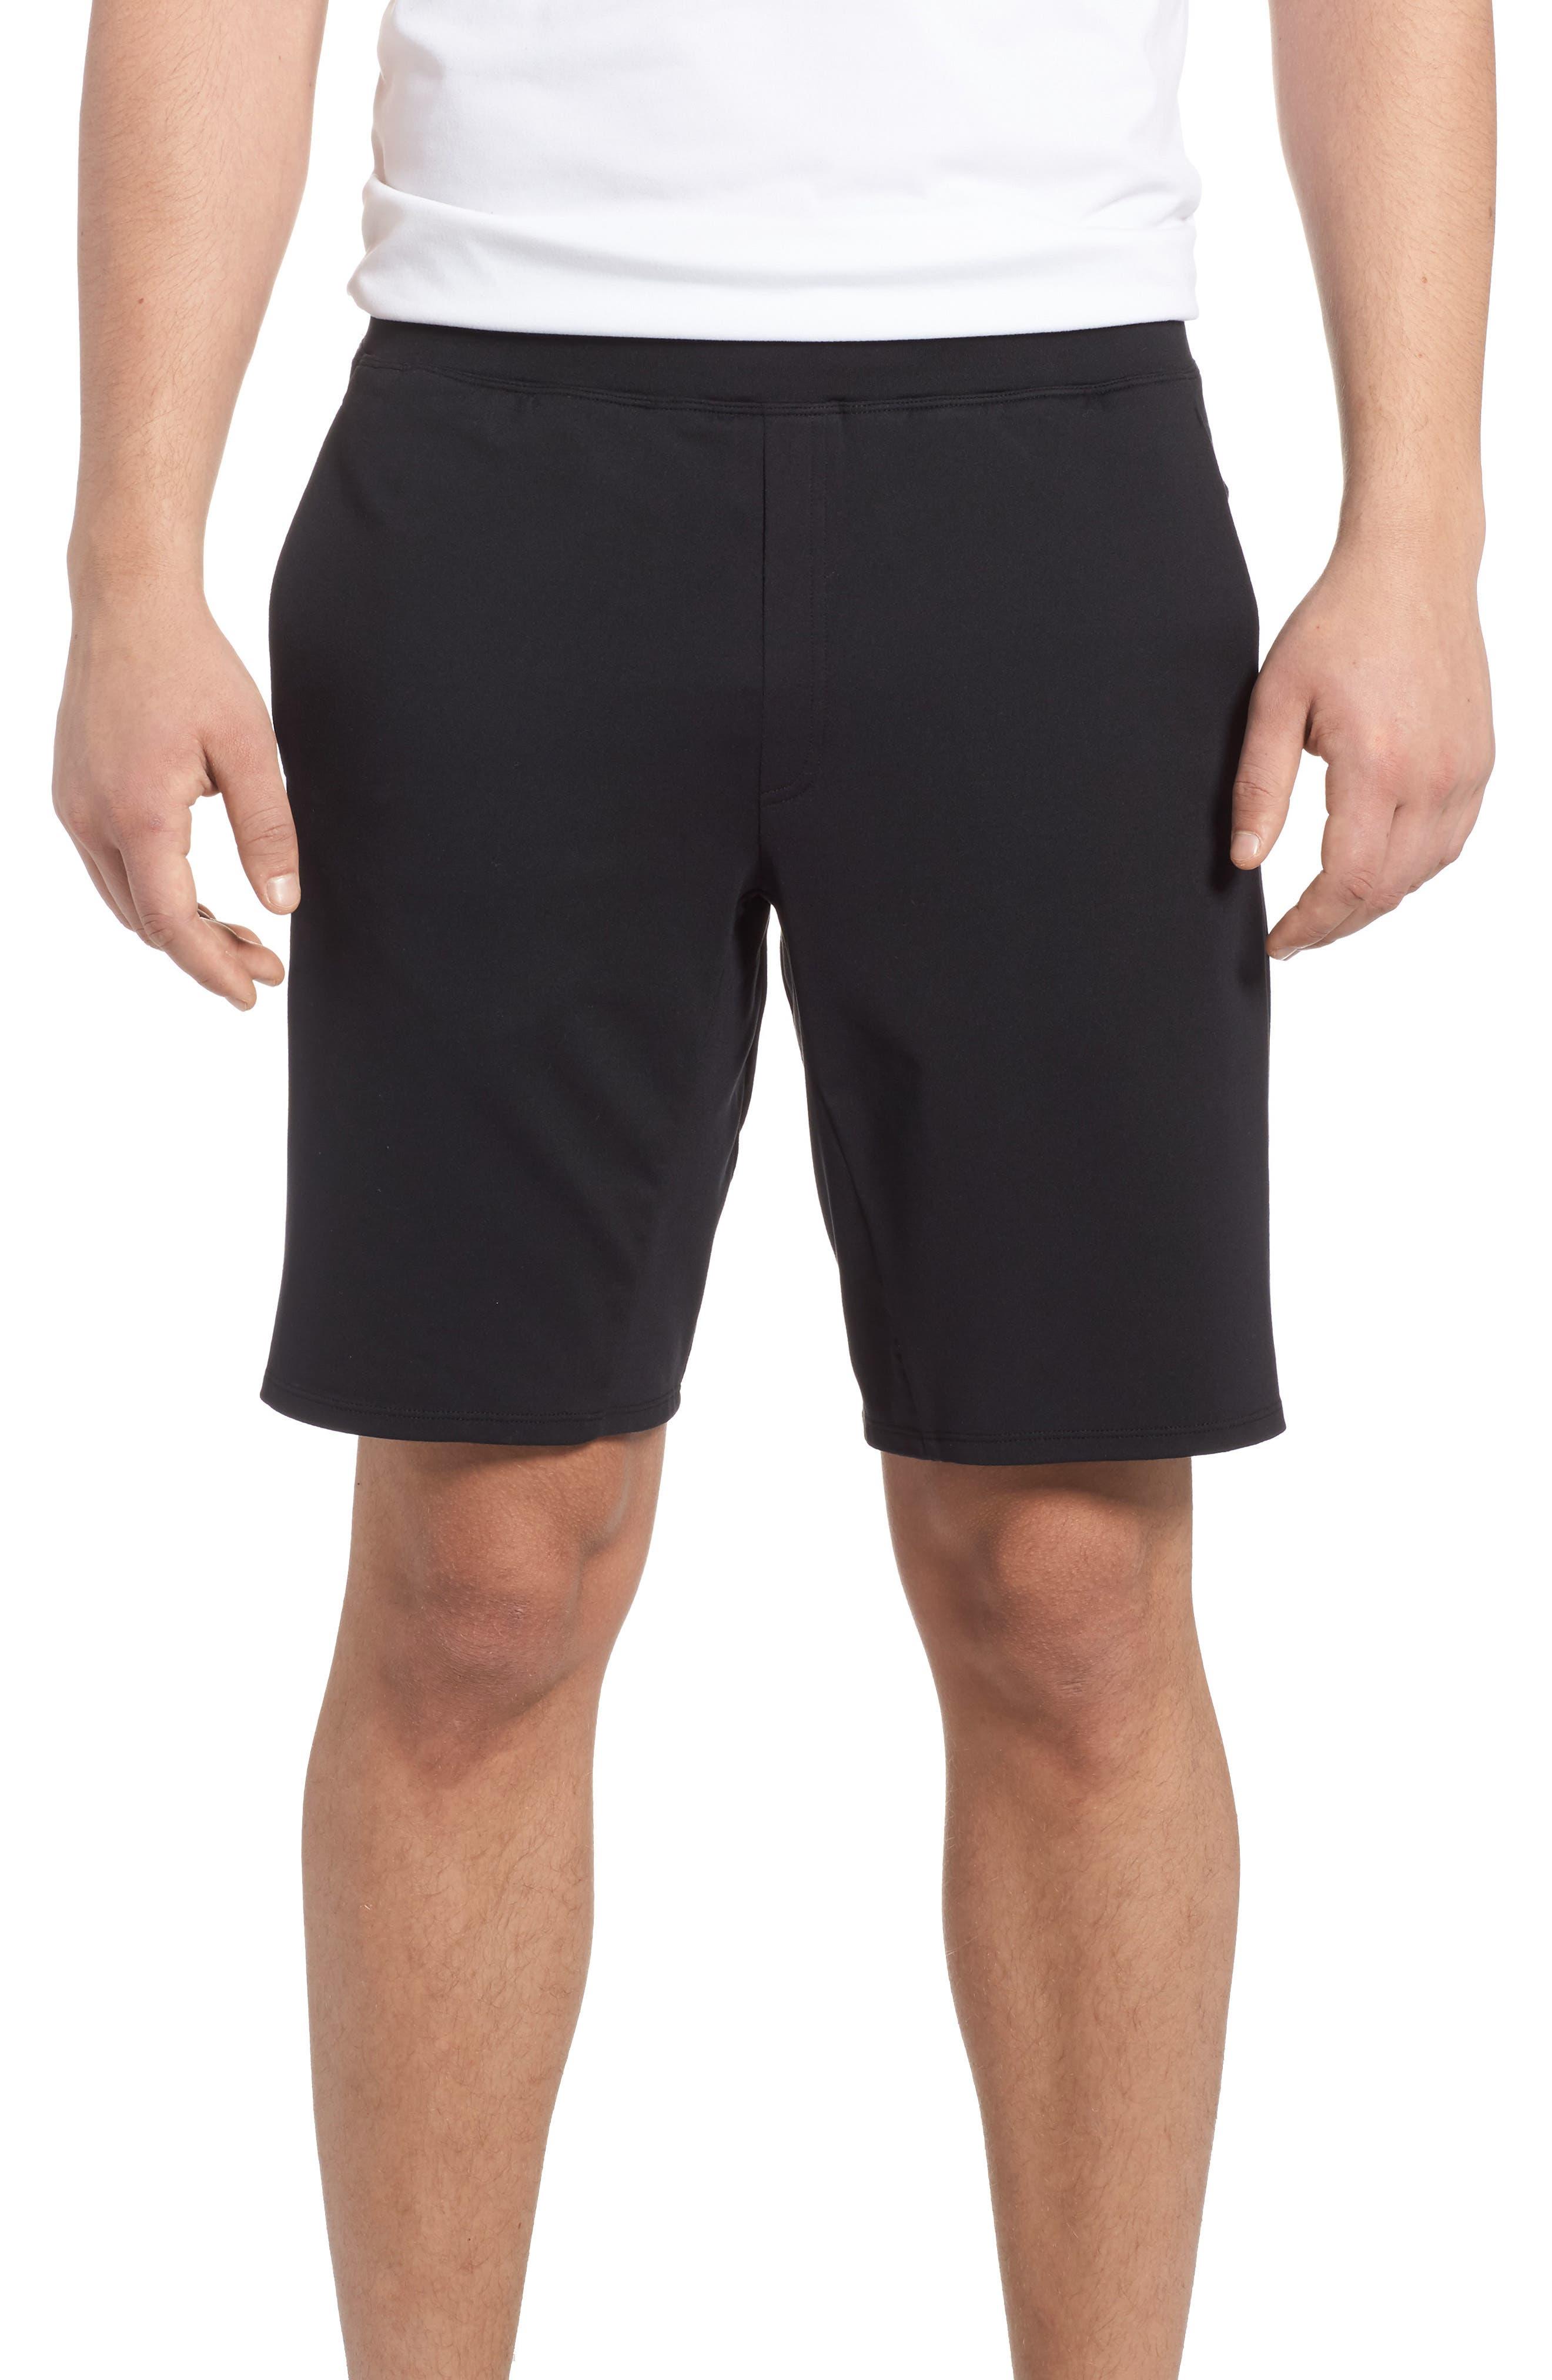 State Athletic Shorts,                             Main thumbnail 1, color,                             001